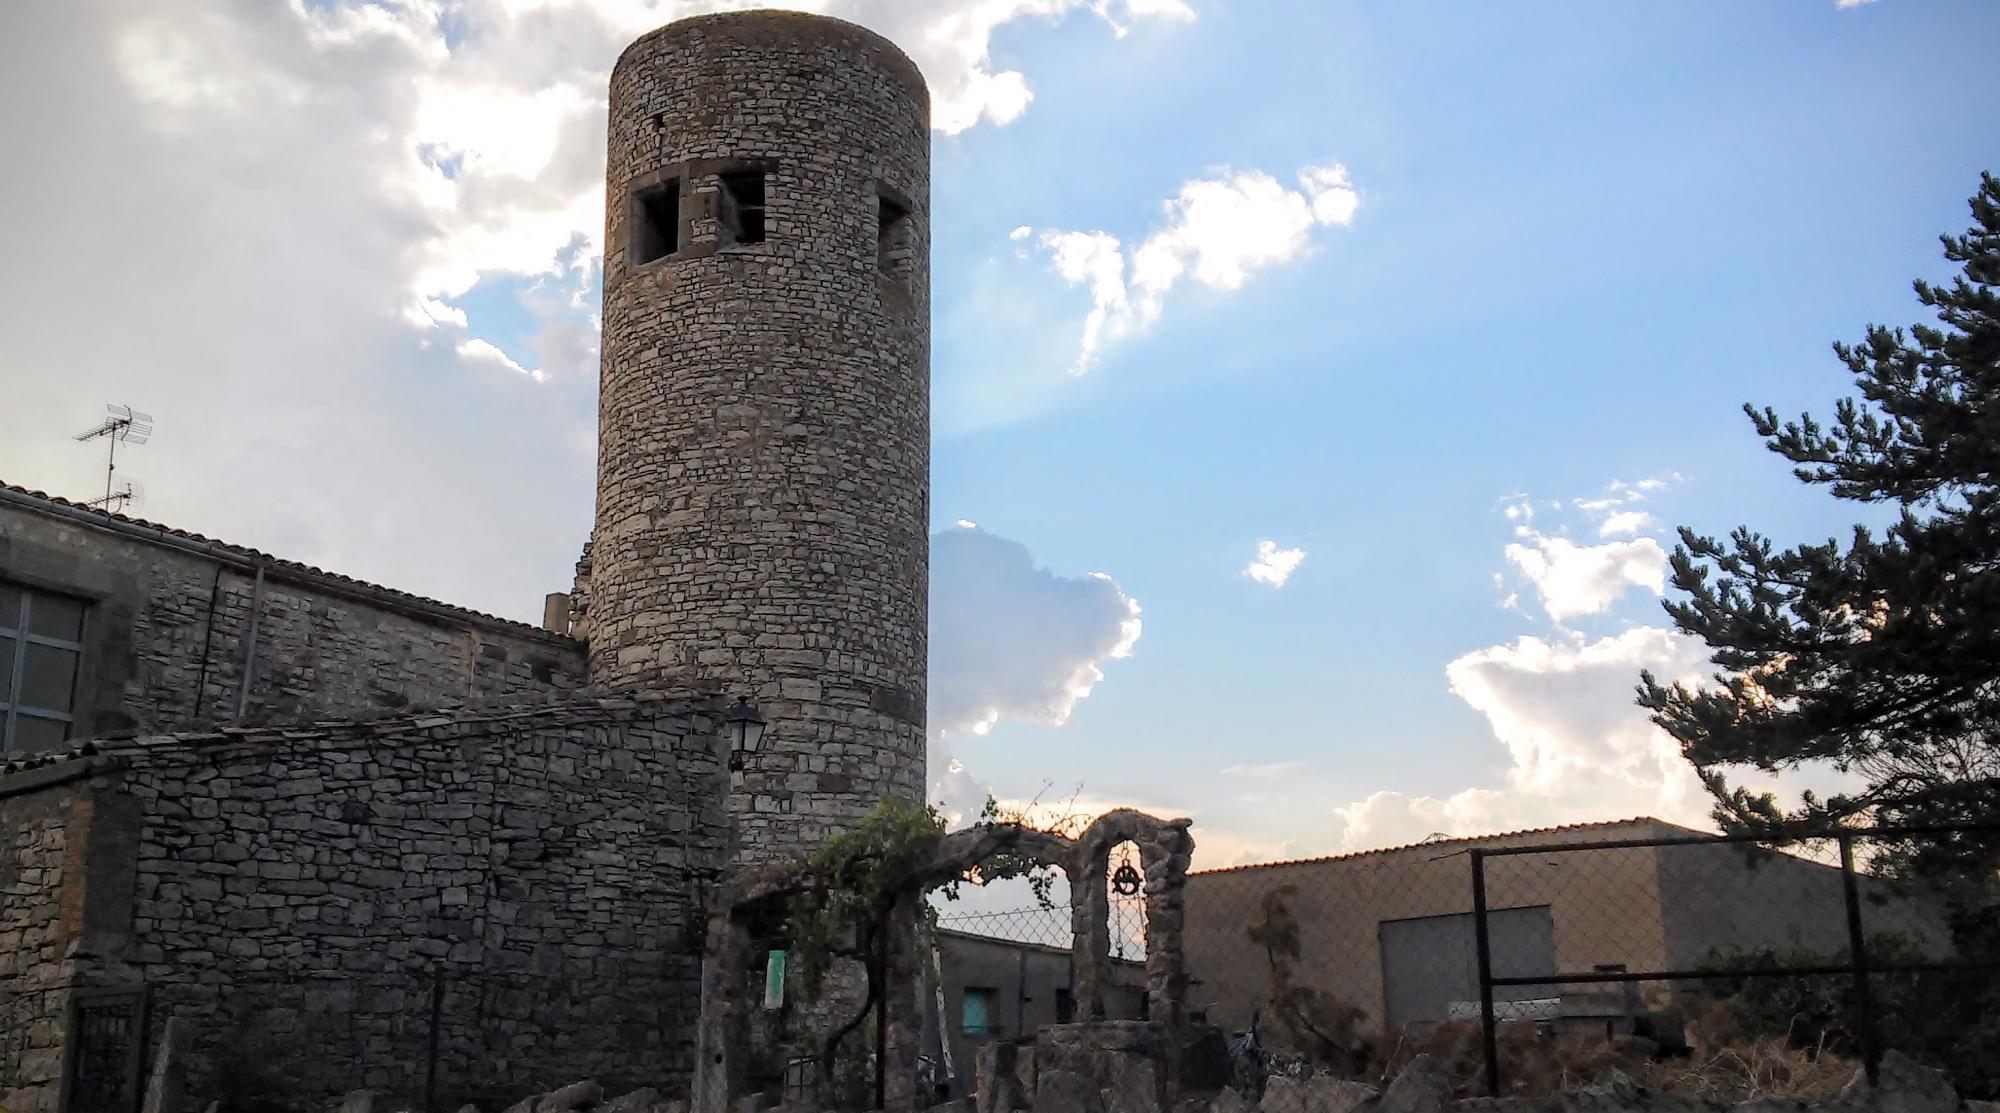 Tower of Gospí